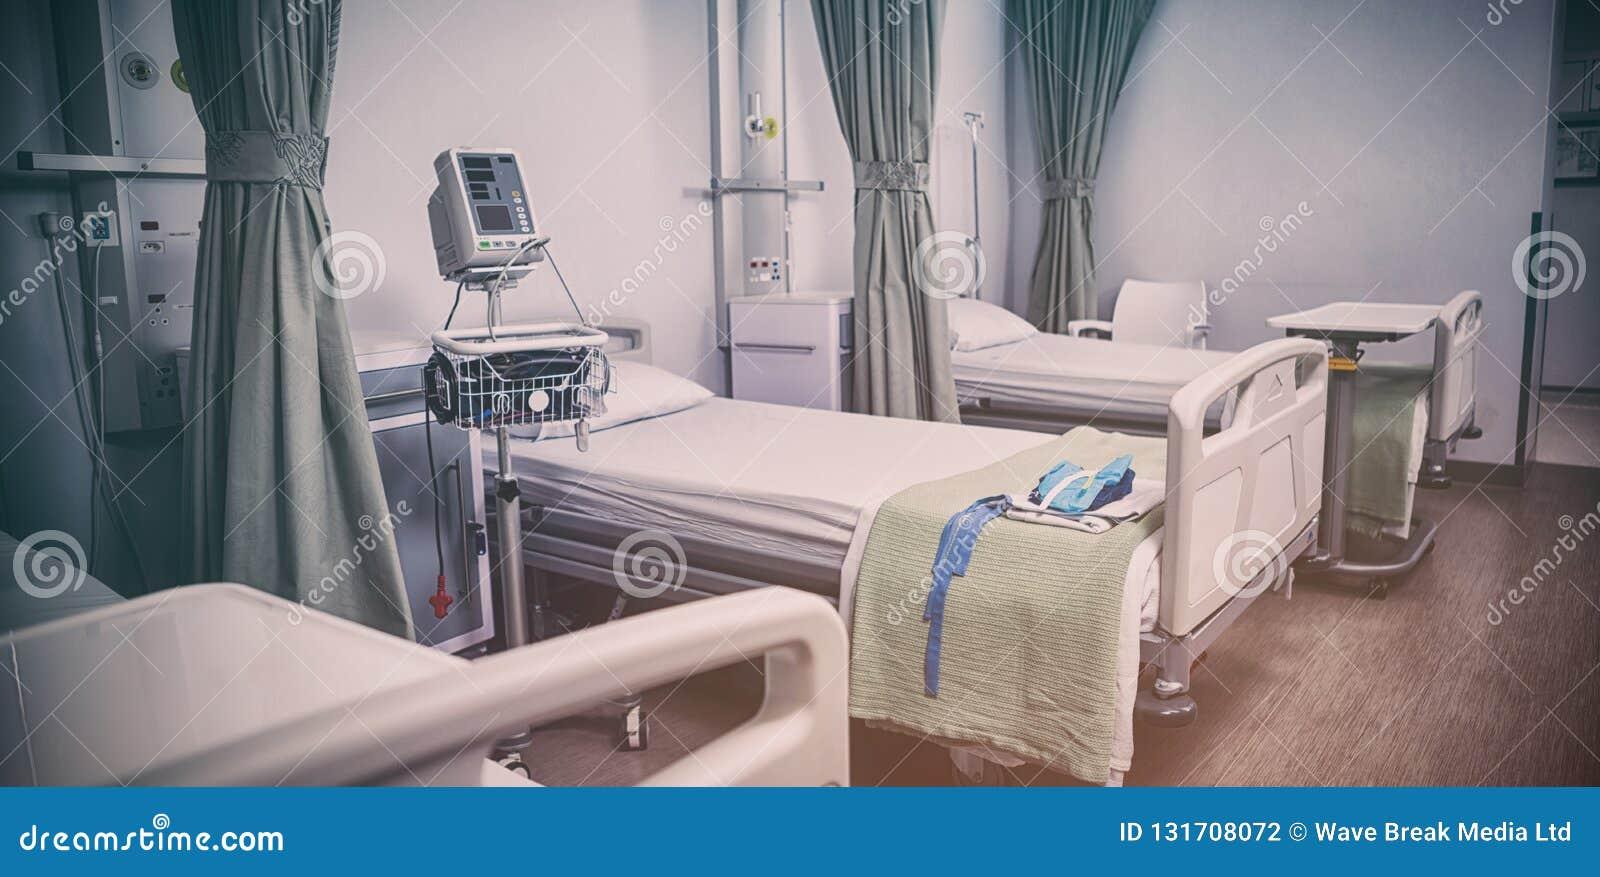 Leere Krankenhausbetten im Krankenhaus